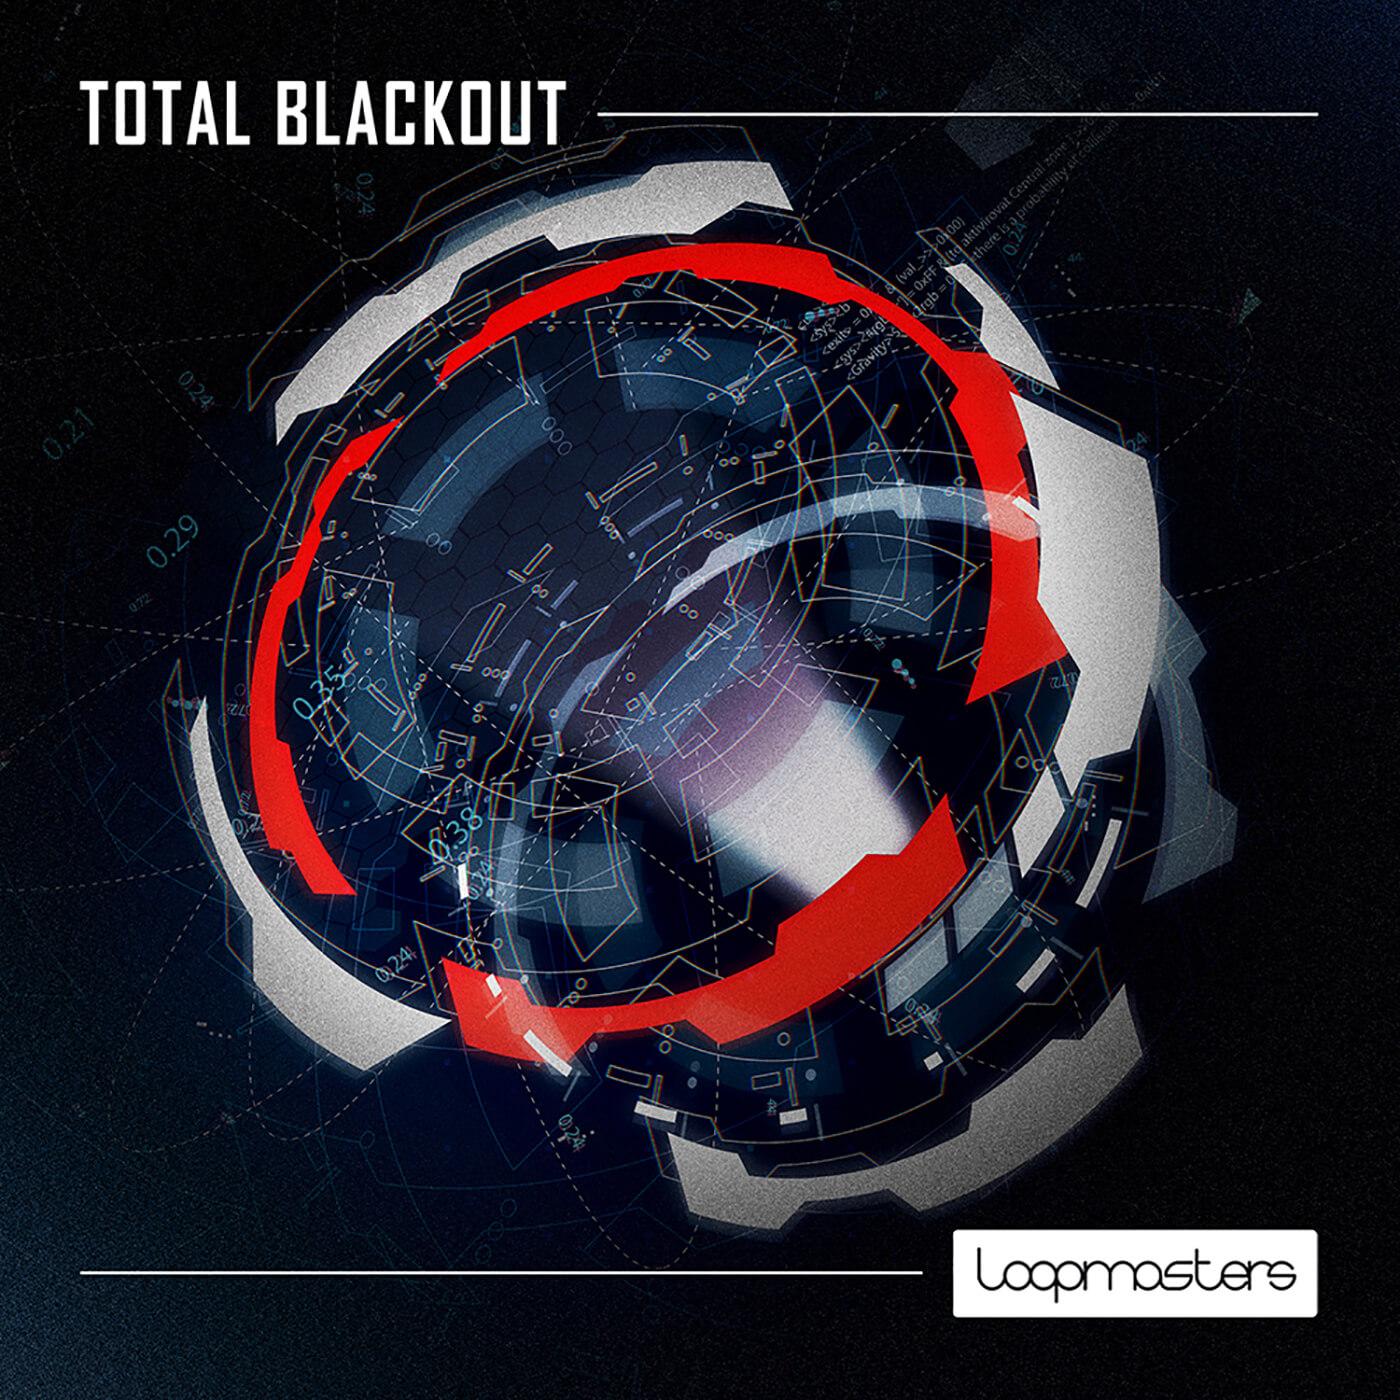 Loopmasters - Total Blackout